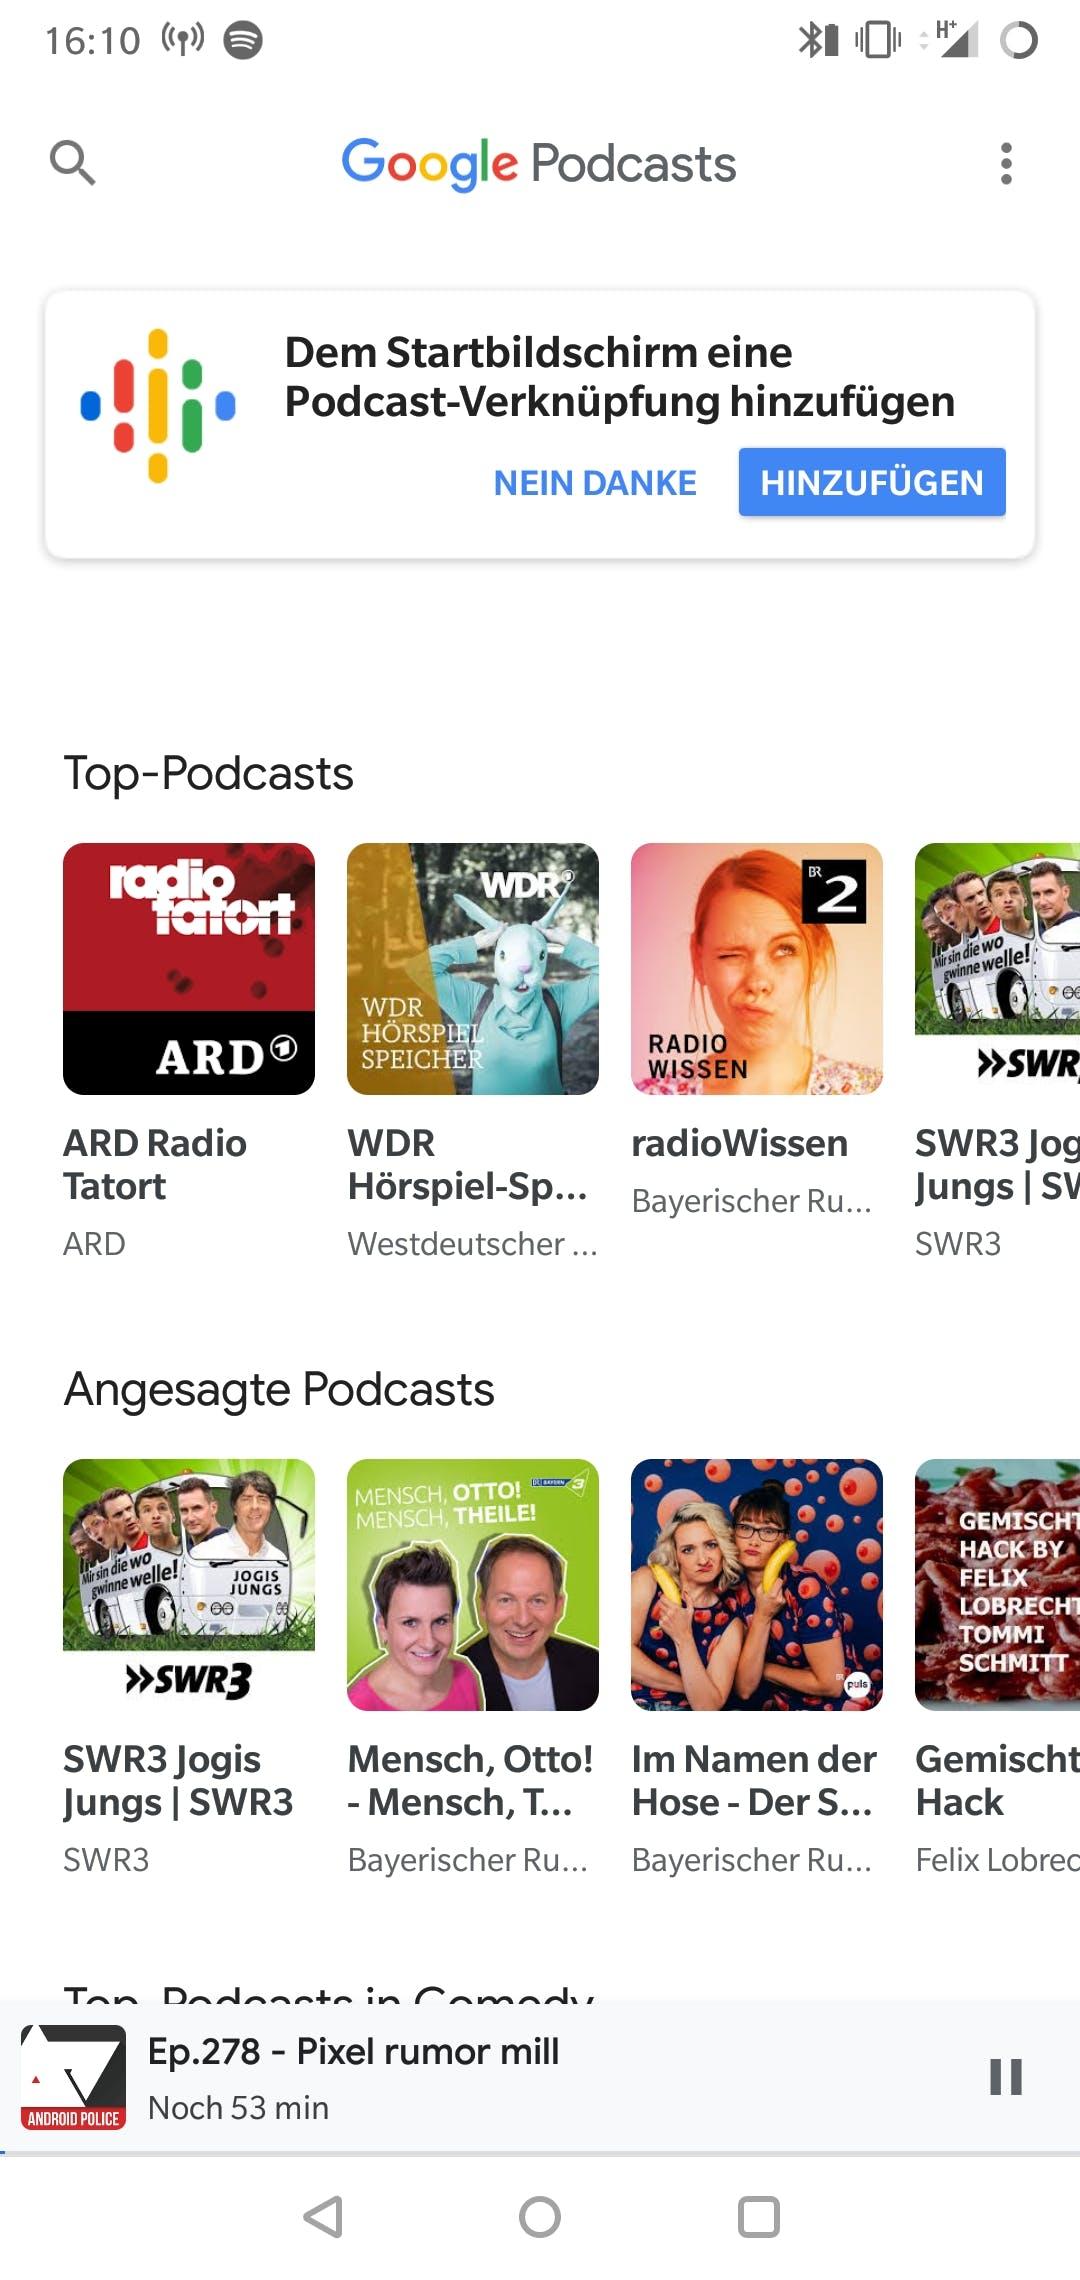 Google-Podcast-App – ein Blick in die Web-App. (Screenshot: t3n.de)